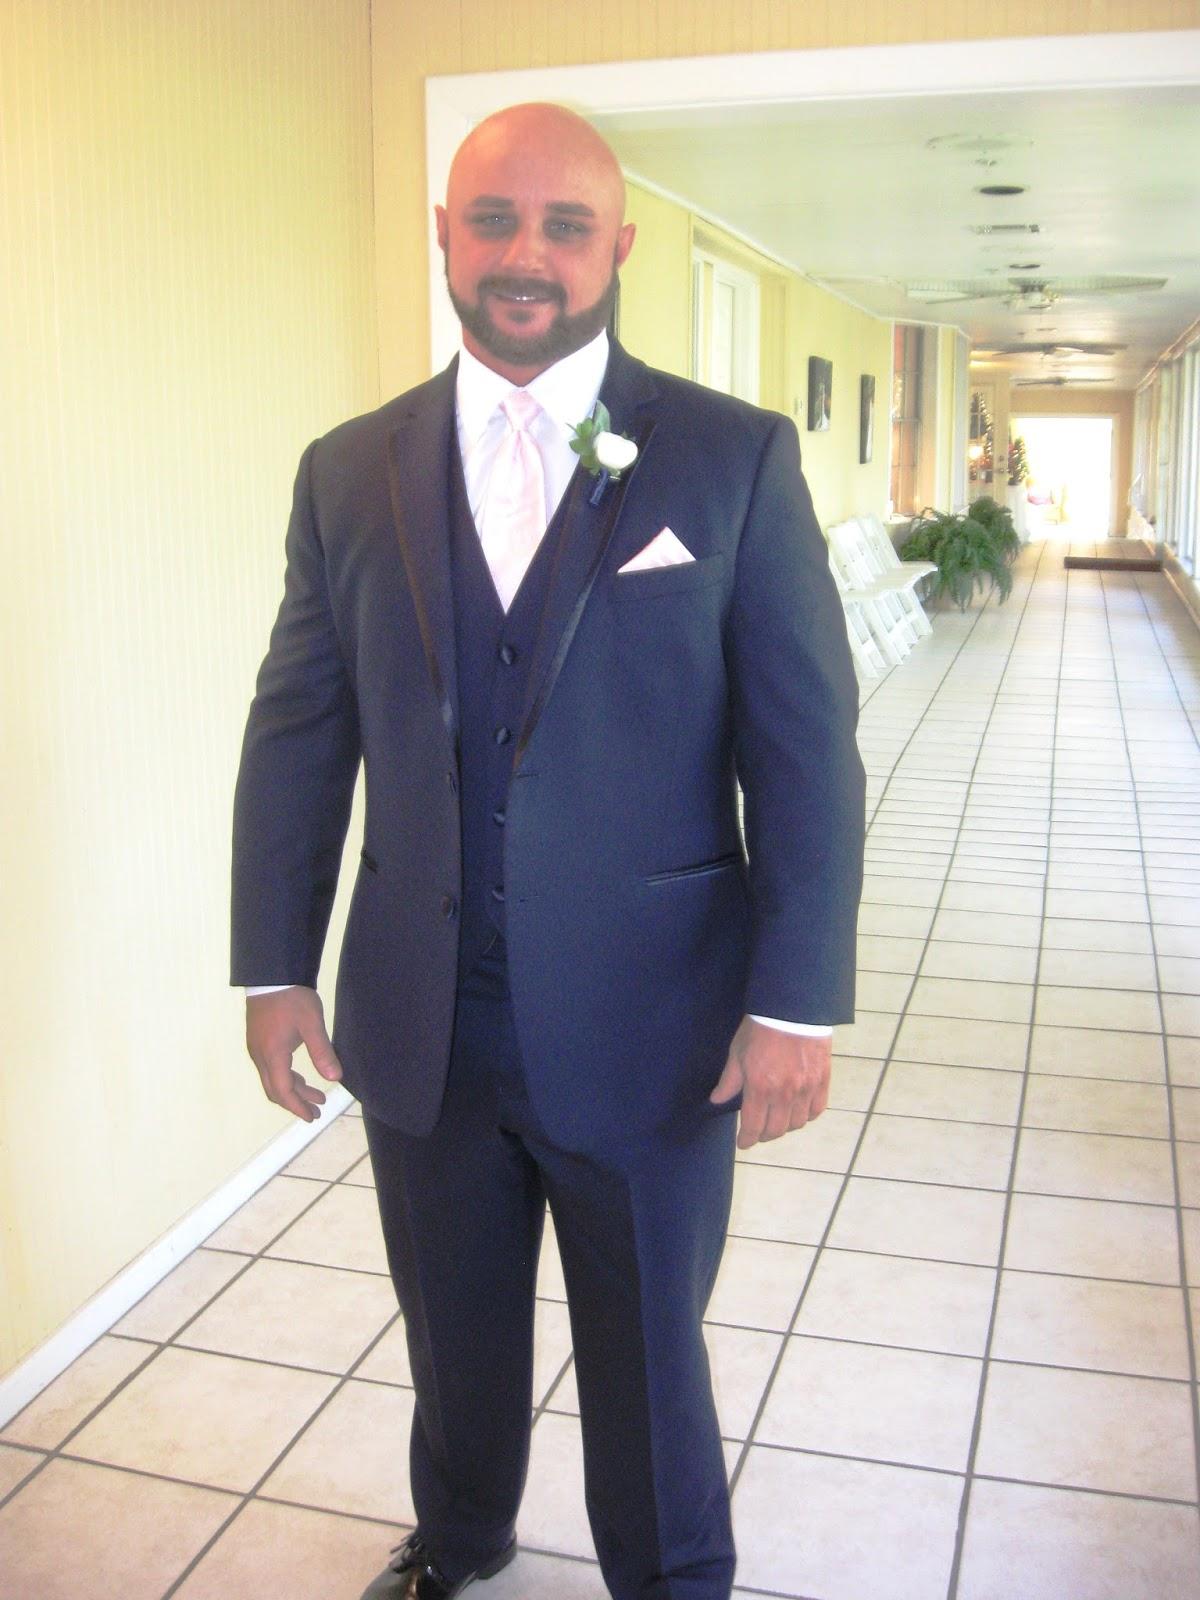 Dalton chapel wedding